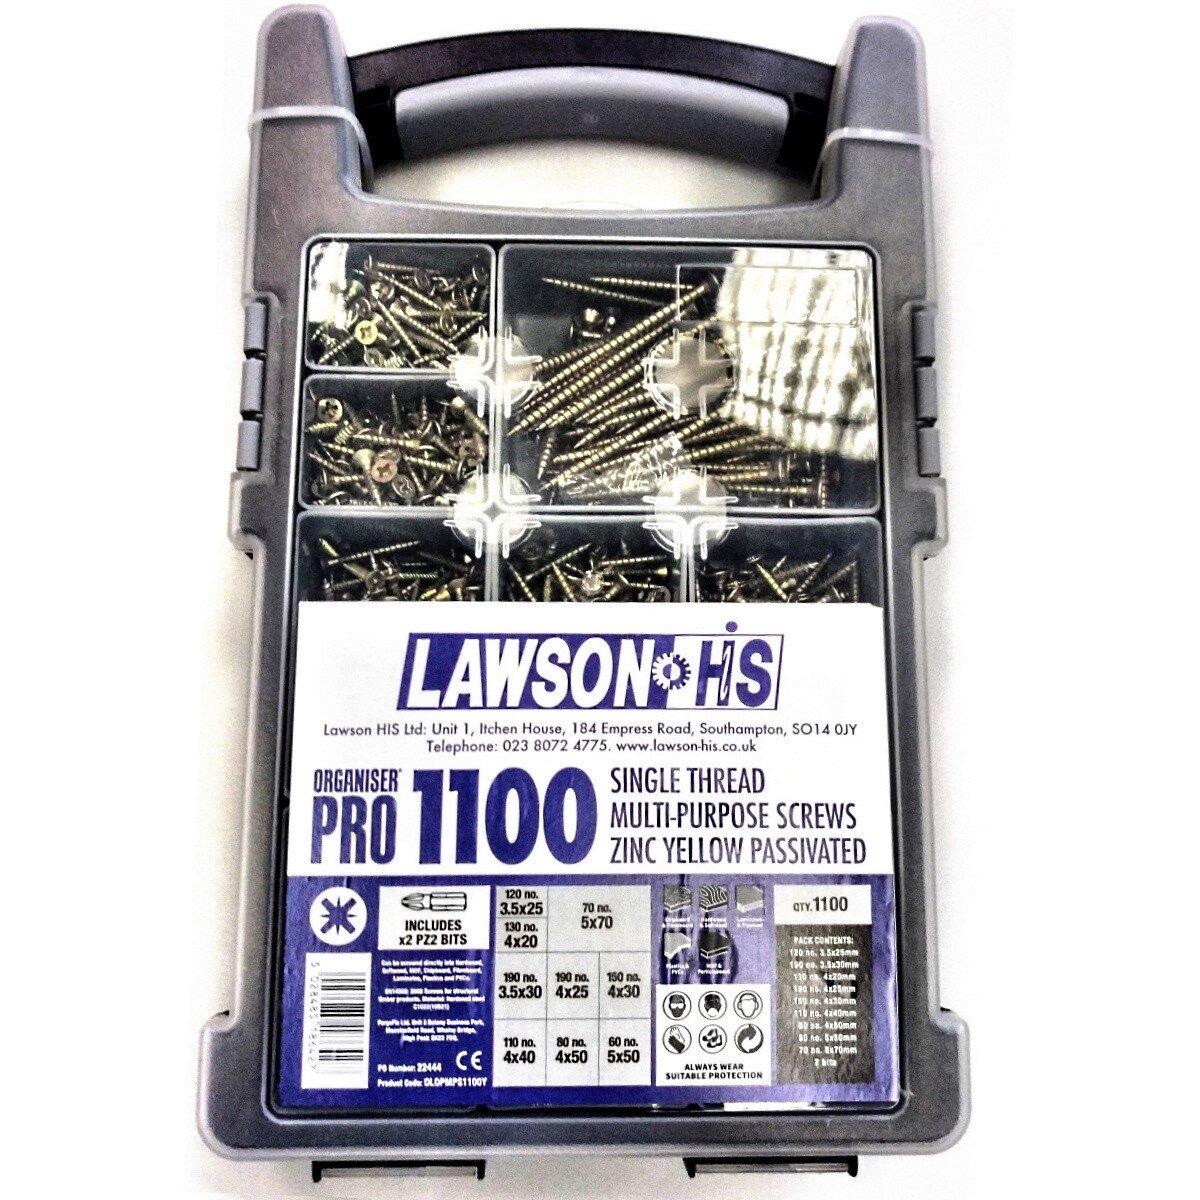 Lawson-HIS OLOPMPS1100Y 1100 Piece Pro Multi Purpose Screw Assortment